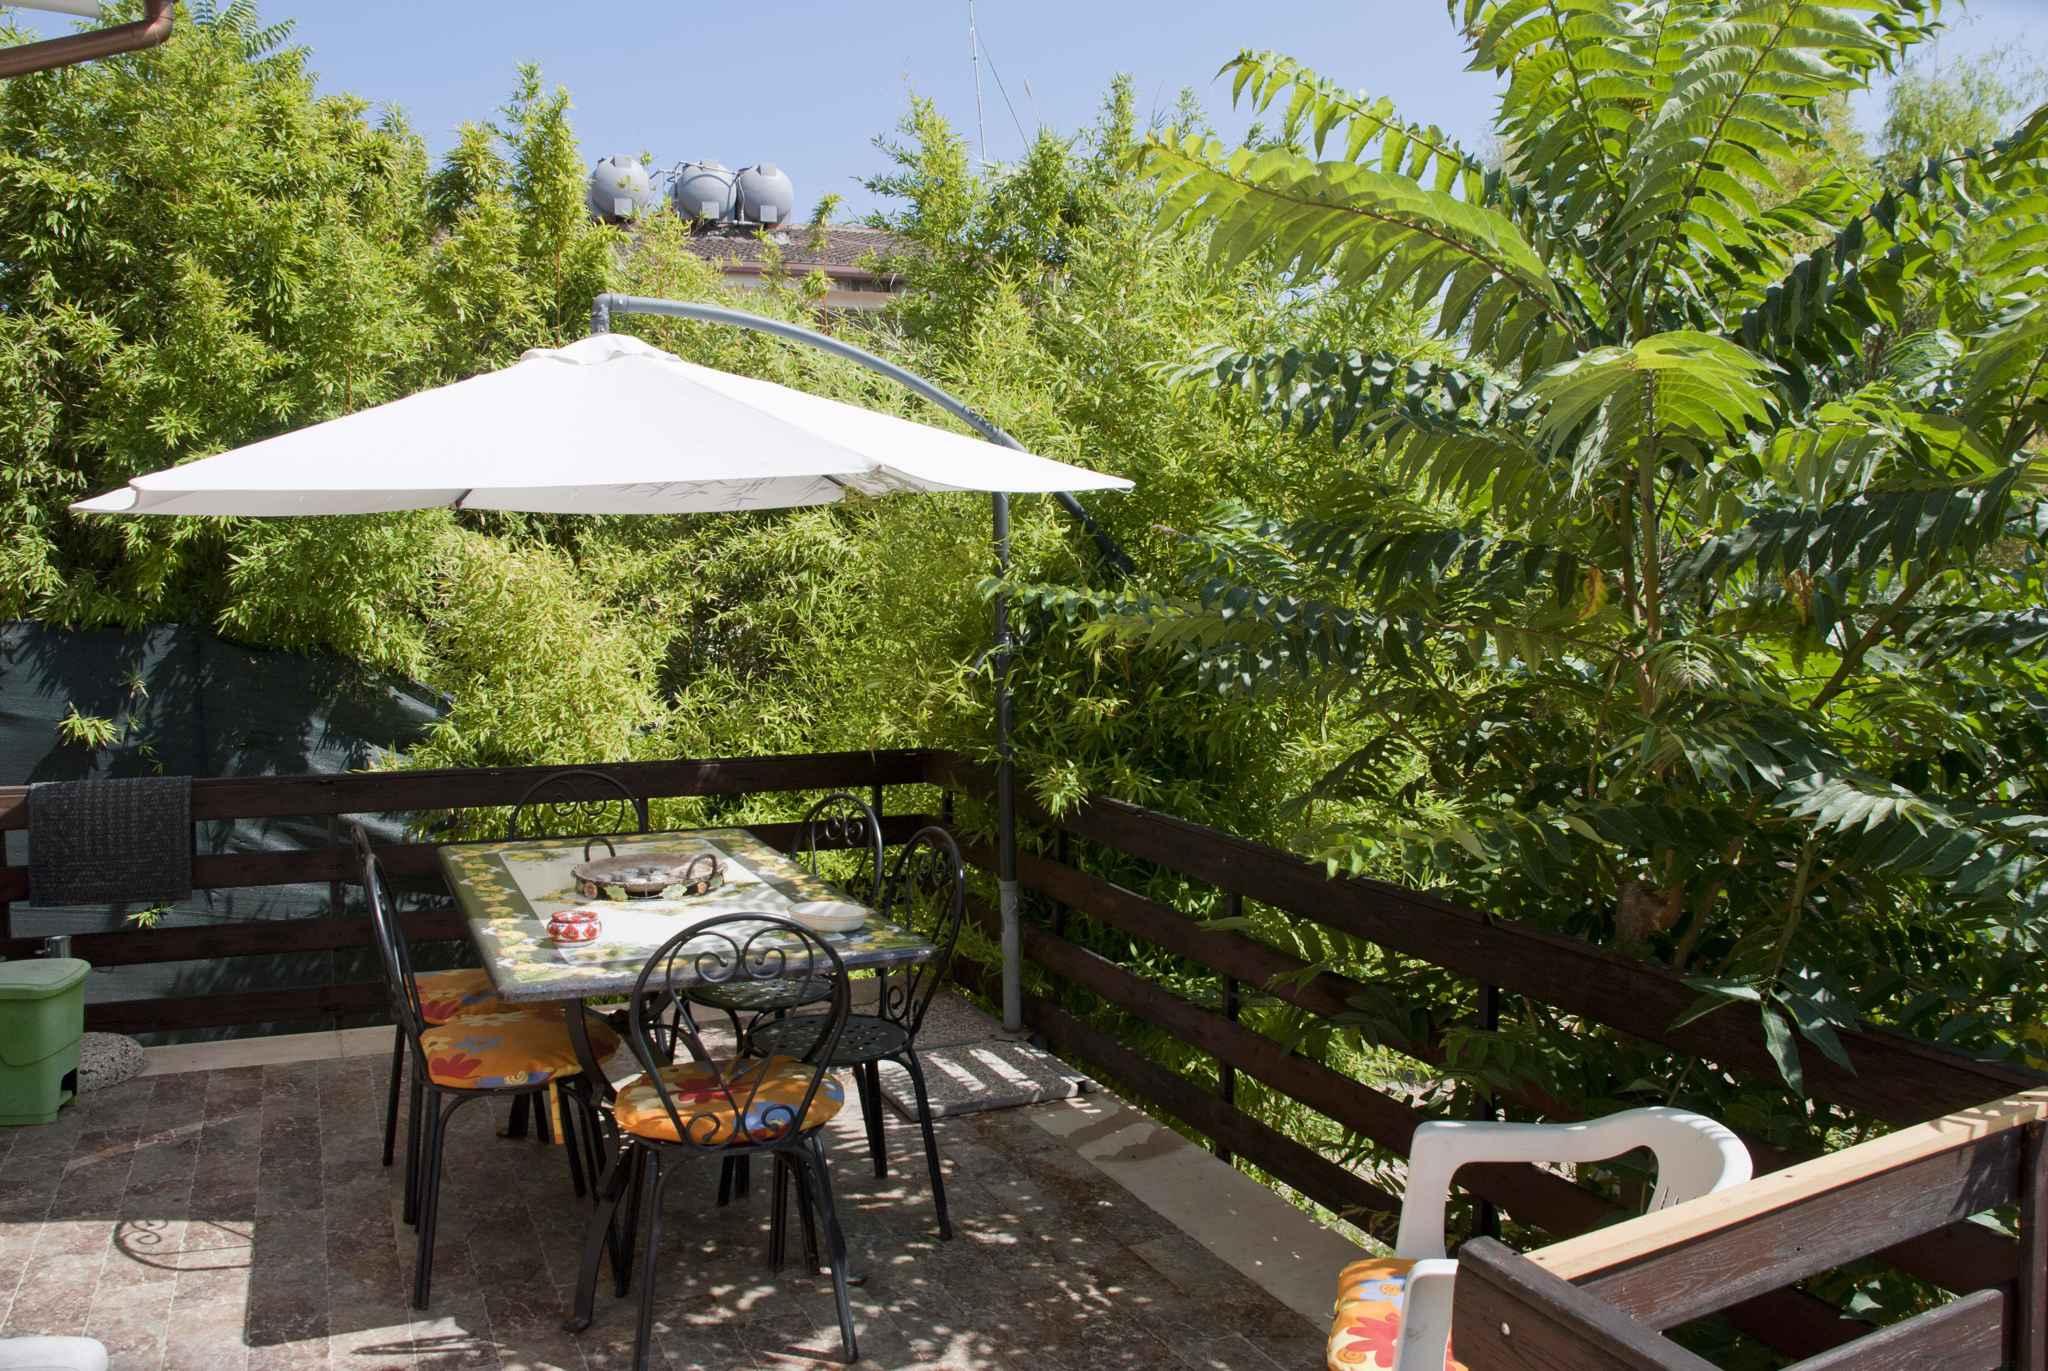 Maison de vacances mit Blick auf Zitronengarten (317534), Lido di Noto, Siracusa, Sicile, Italie, image 12